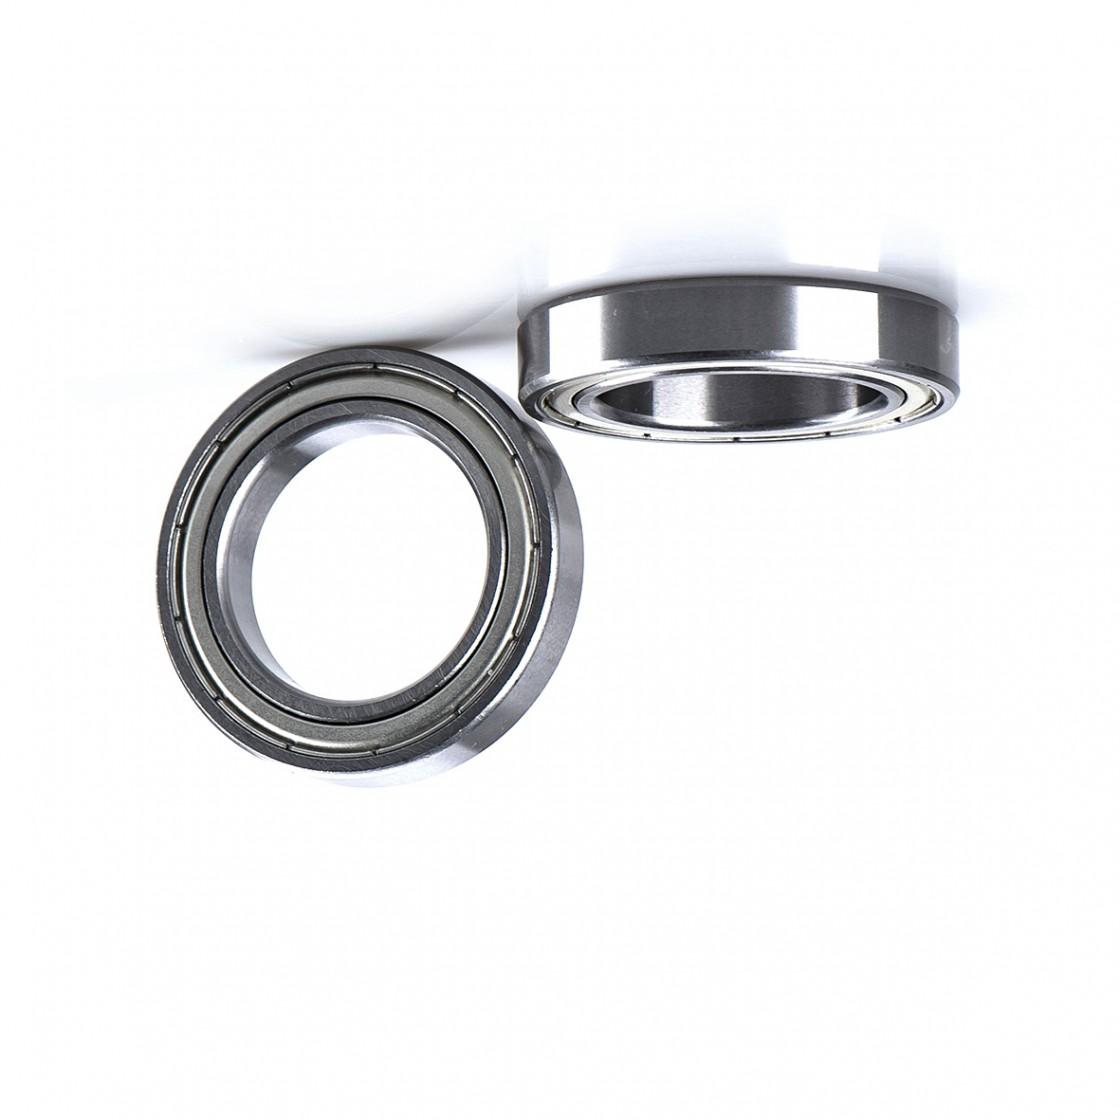 NACHI original korea fiber deep groove ball bearing 6300 6301 6302 6303 6304